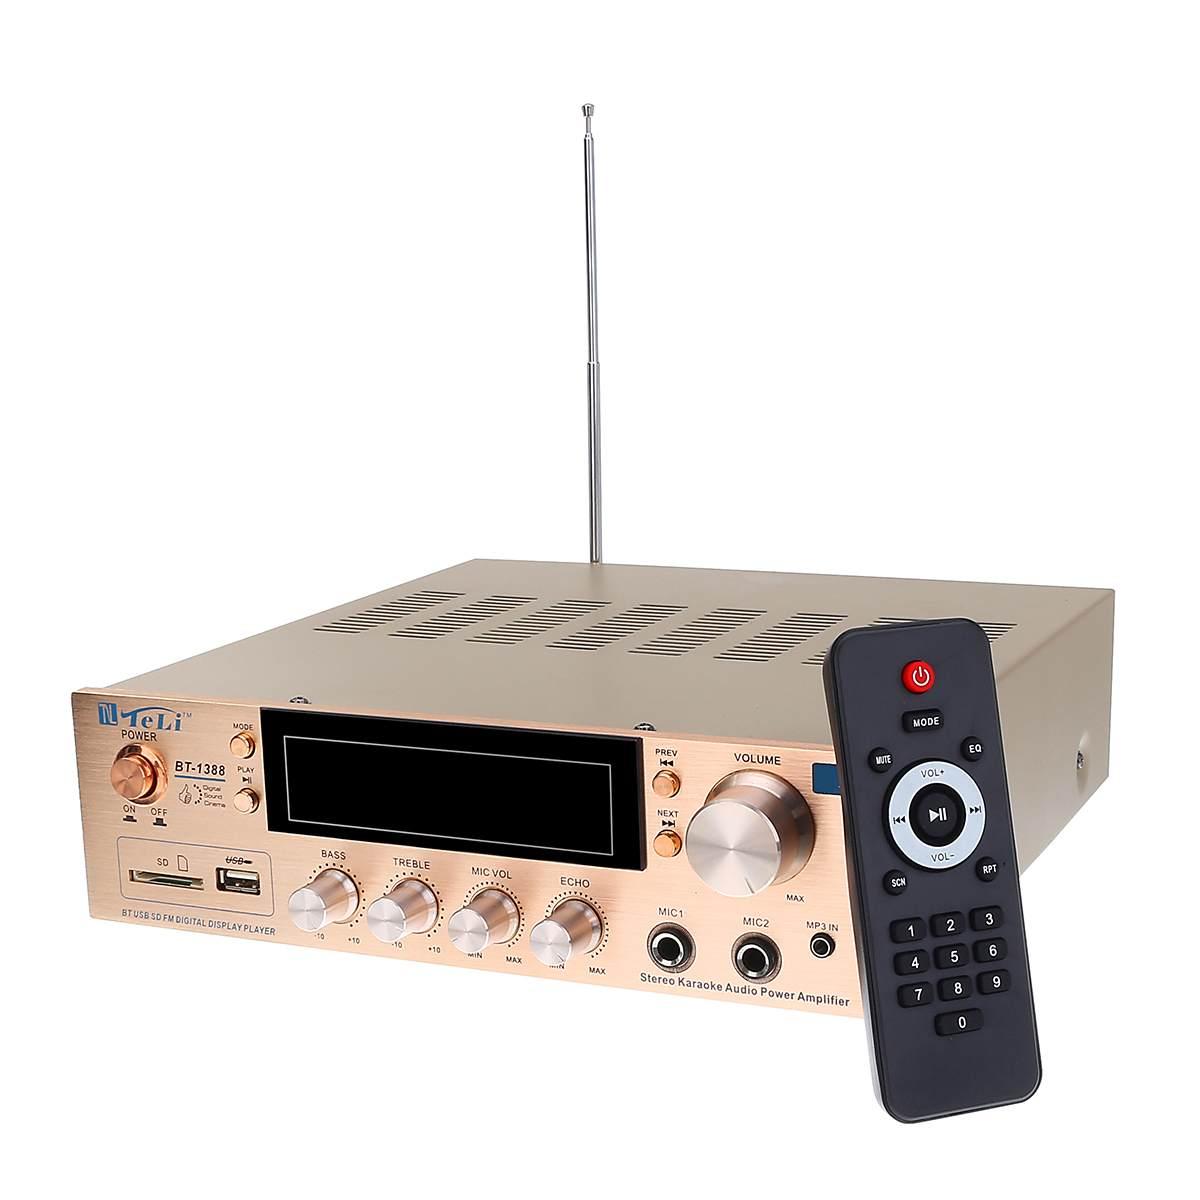 800W HIFI 2 Kanal Hause bluetooth Stereo Verstärker Karaoke FM Radio USB SD Power Heimkino Verstärker mit Fernbedienung controller